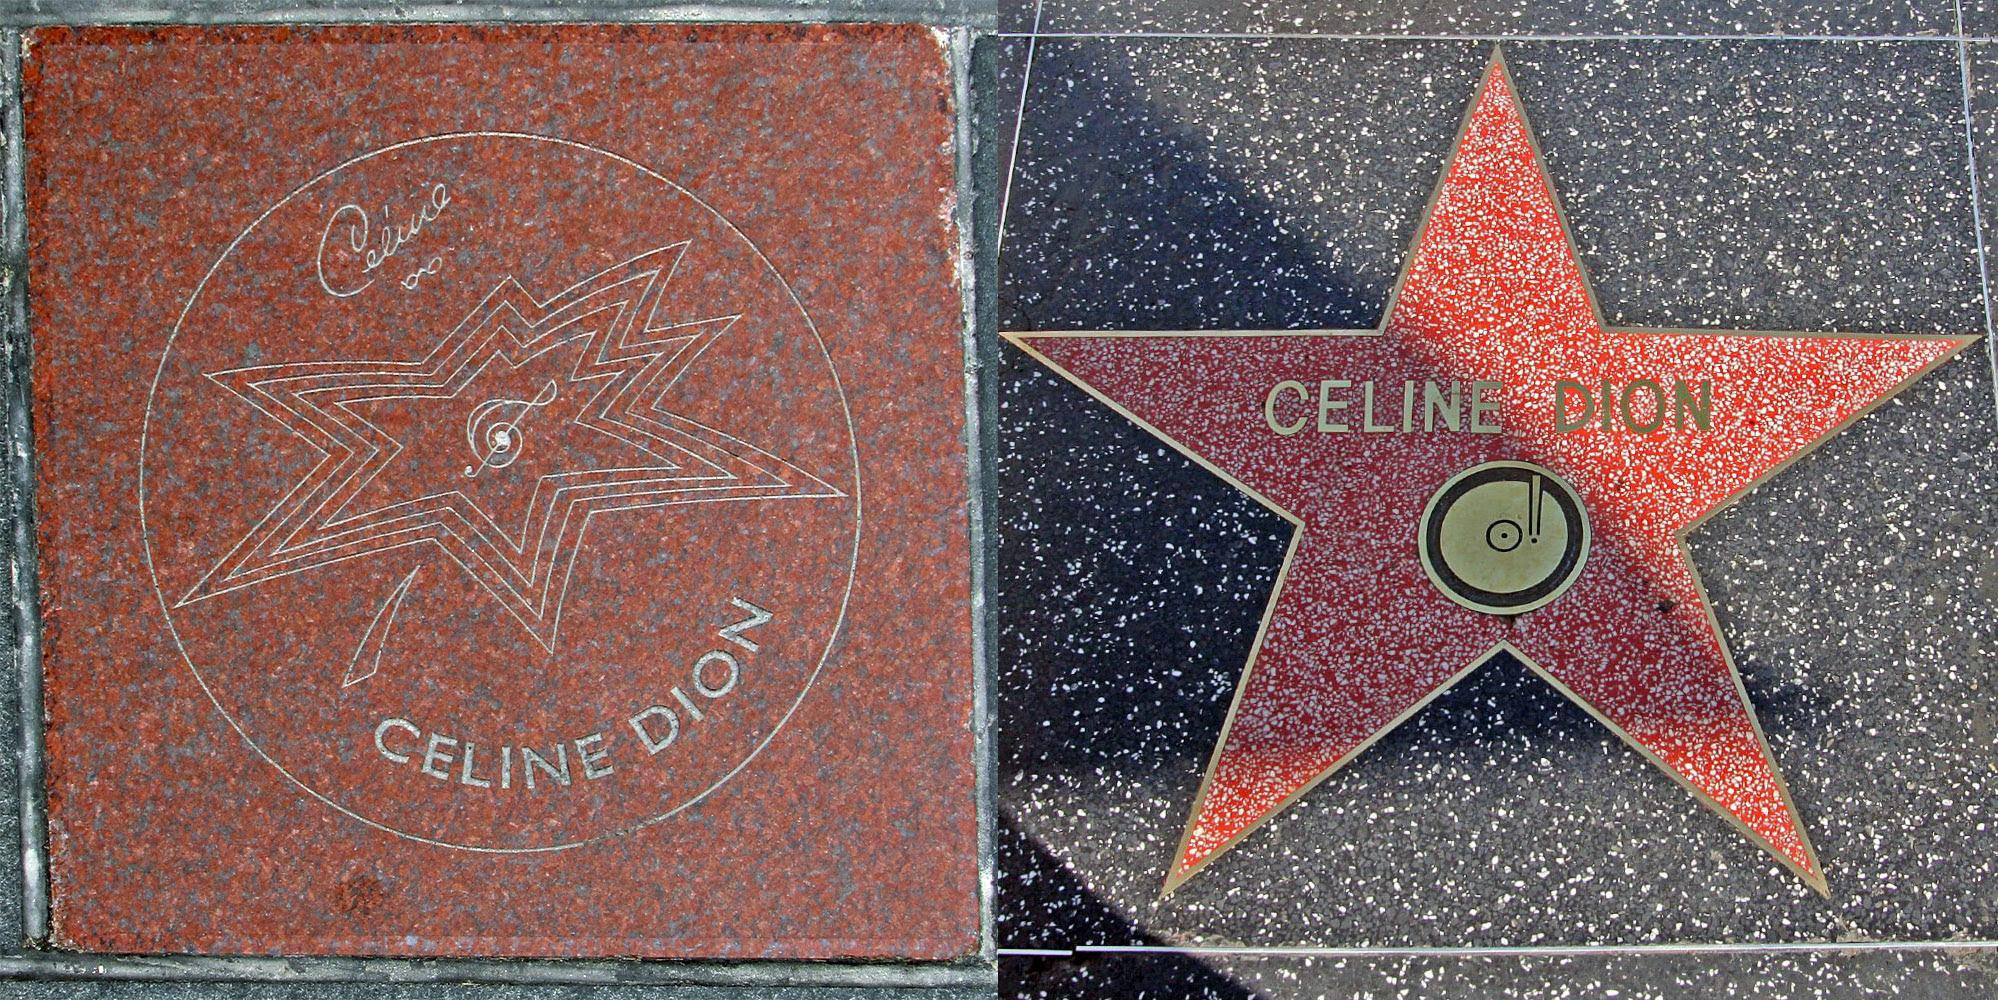 Celine Dion - Wikipedia, the free encyclopedia